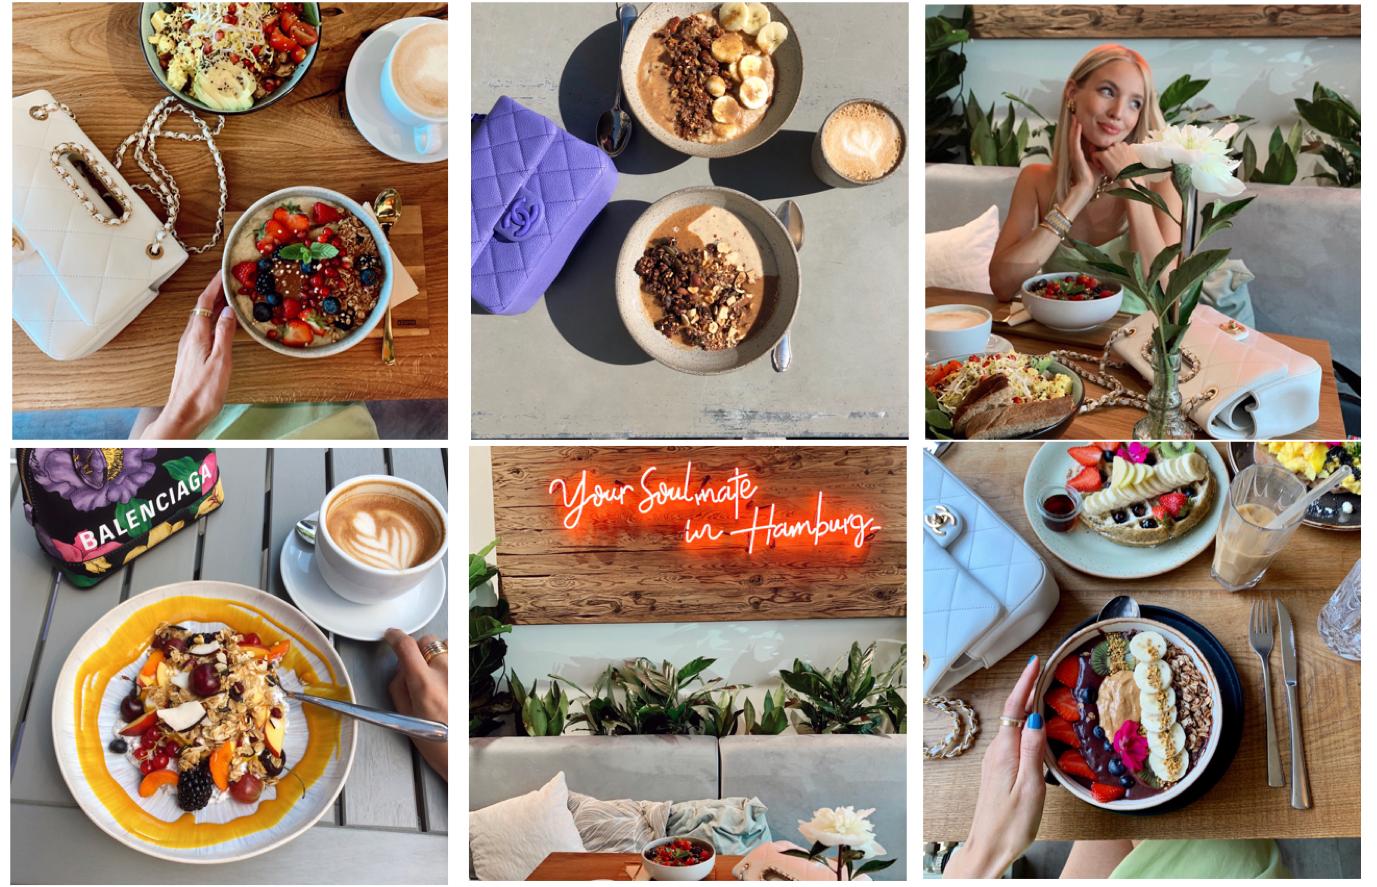 Hamburg Food Guide Collage